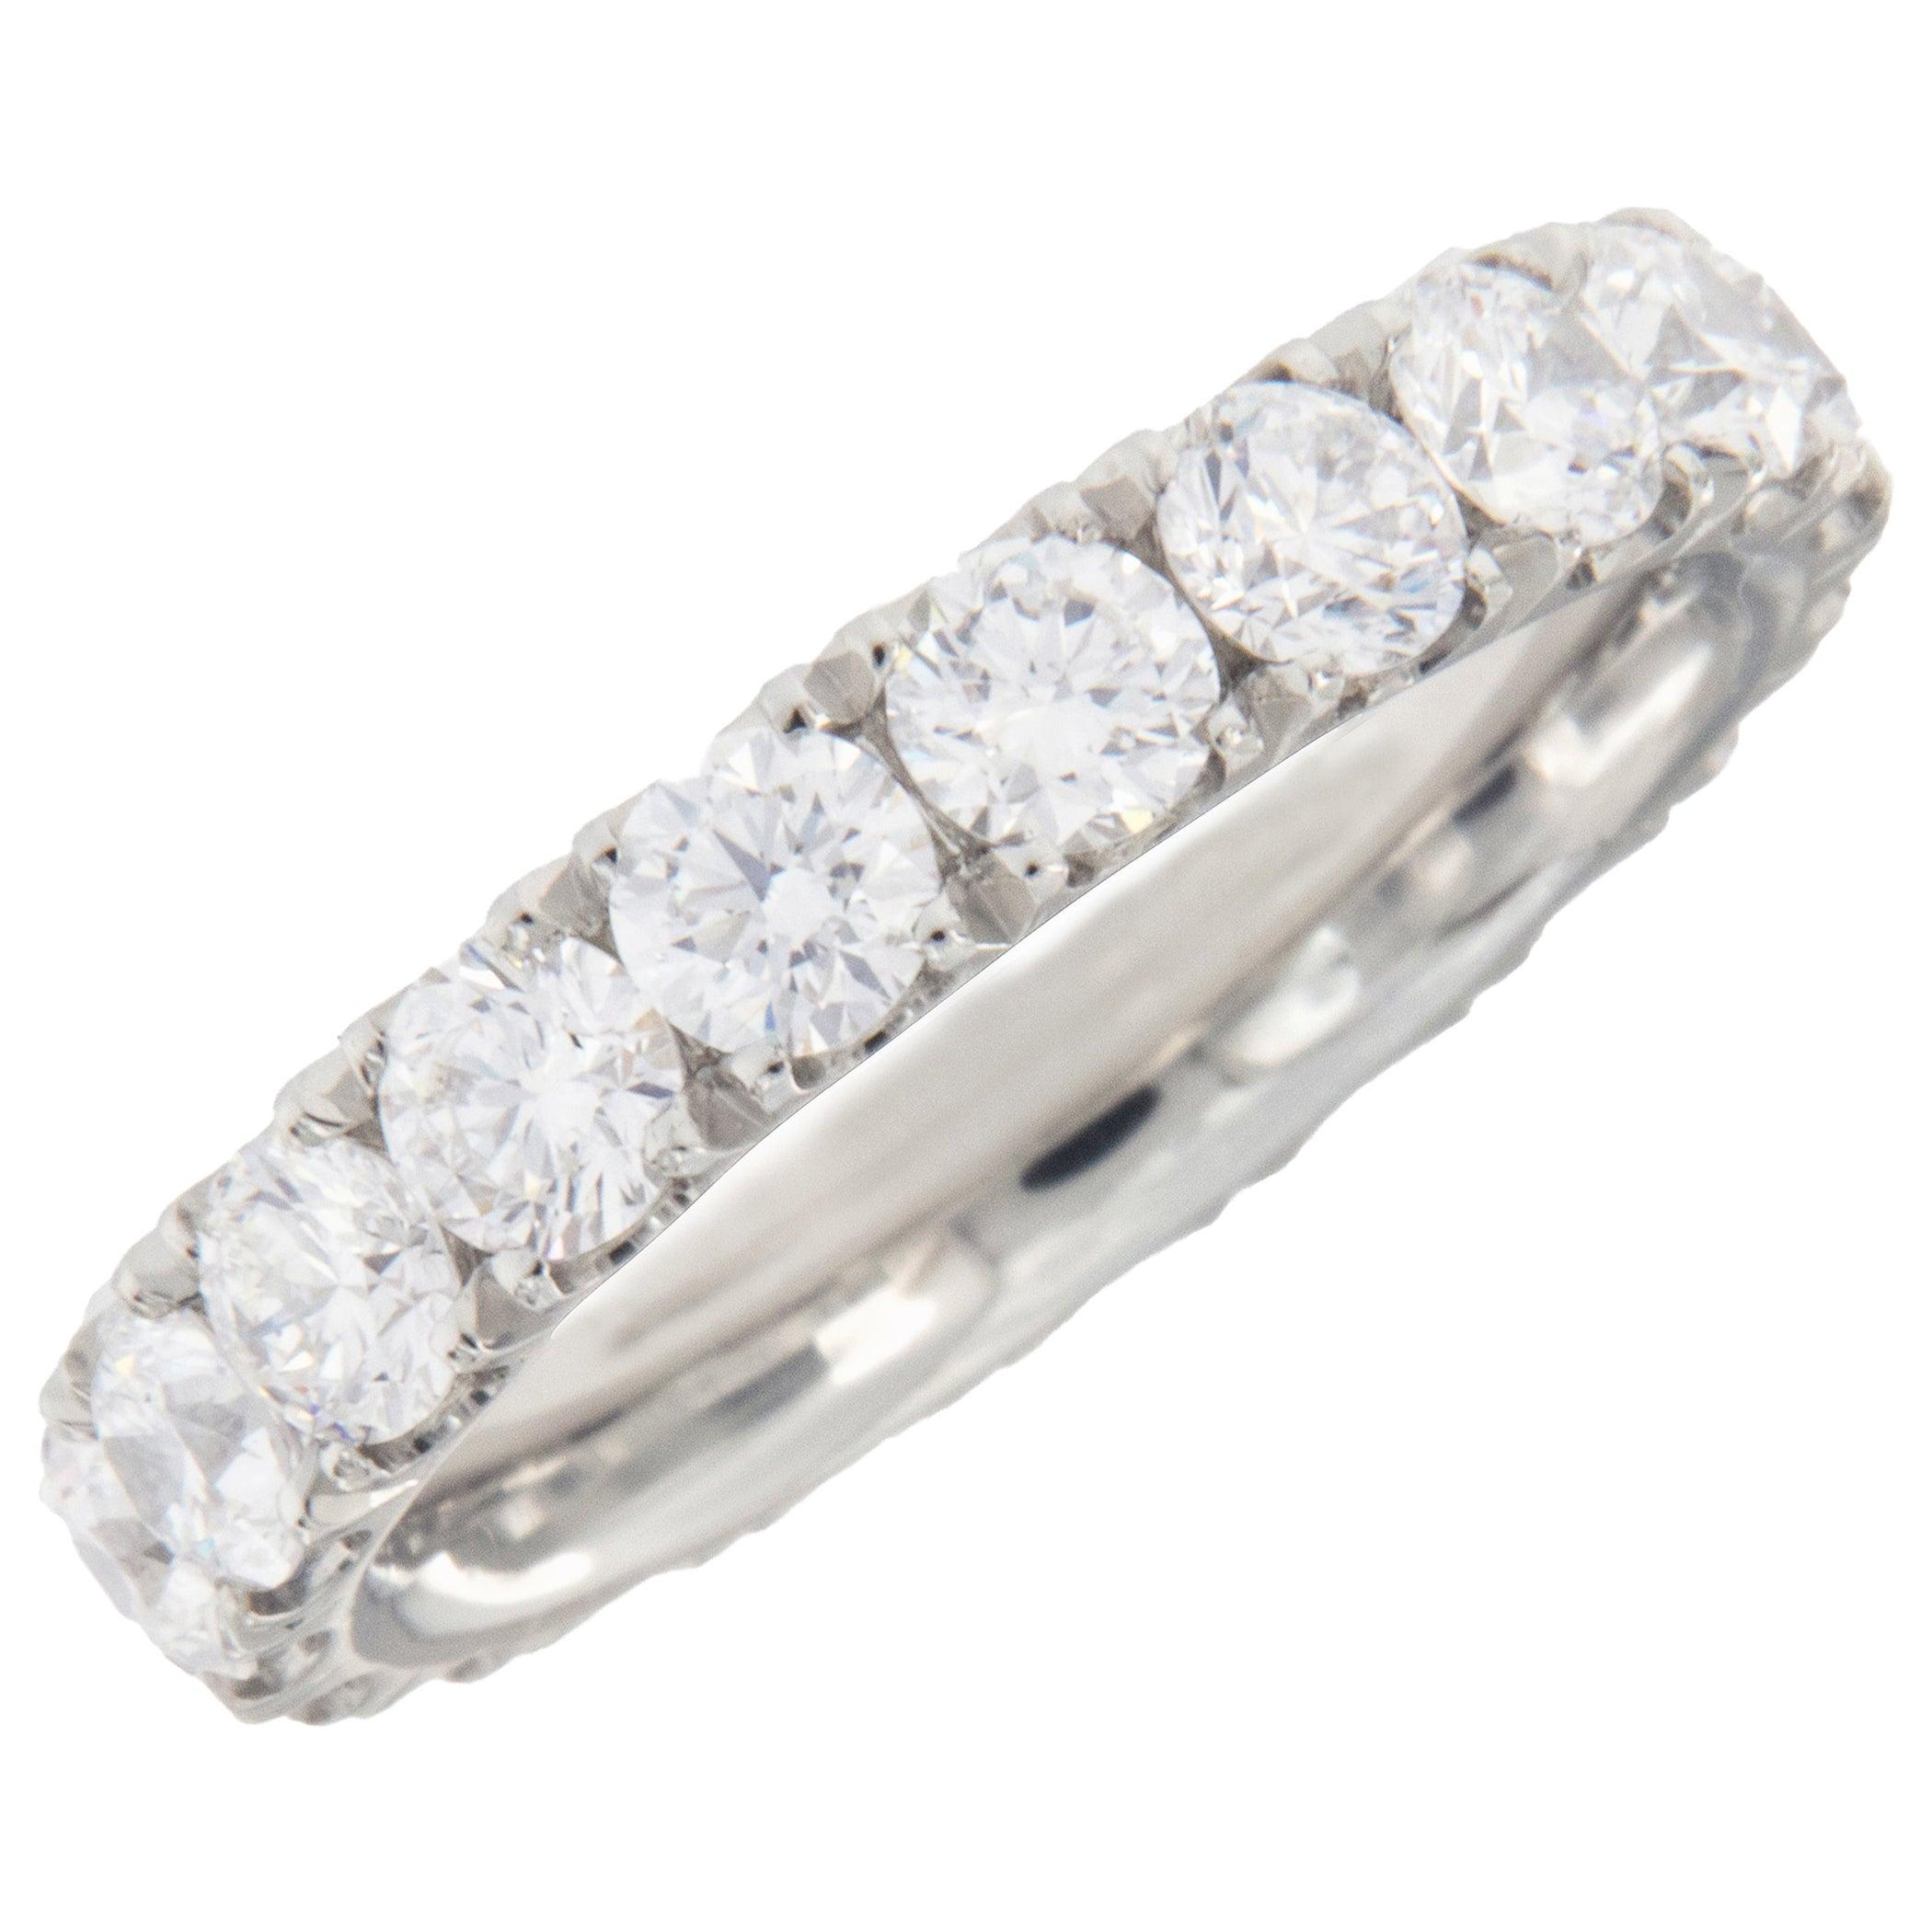 William Rosenberg D VVS Platinum Diamond Eternity Band 2.78 Carat